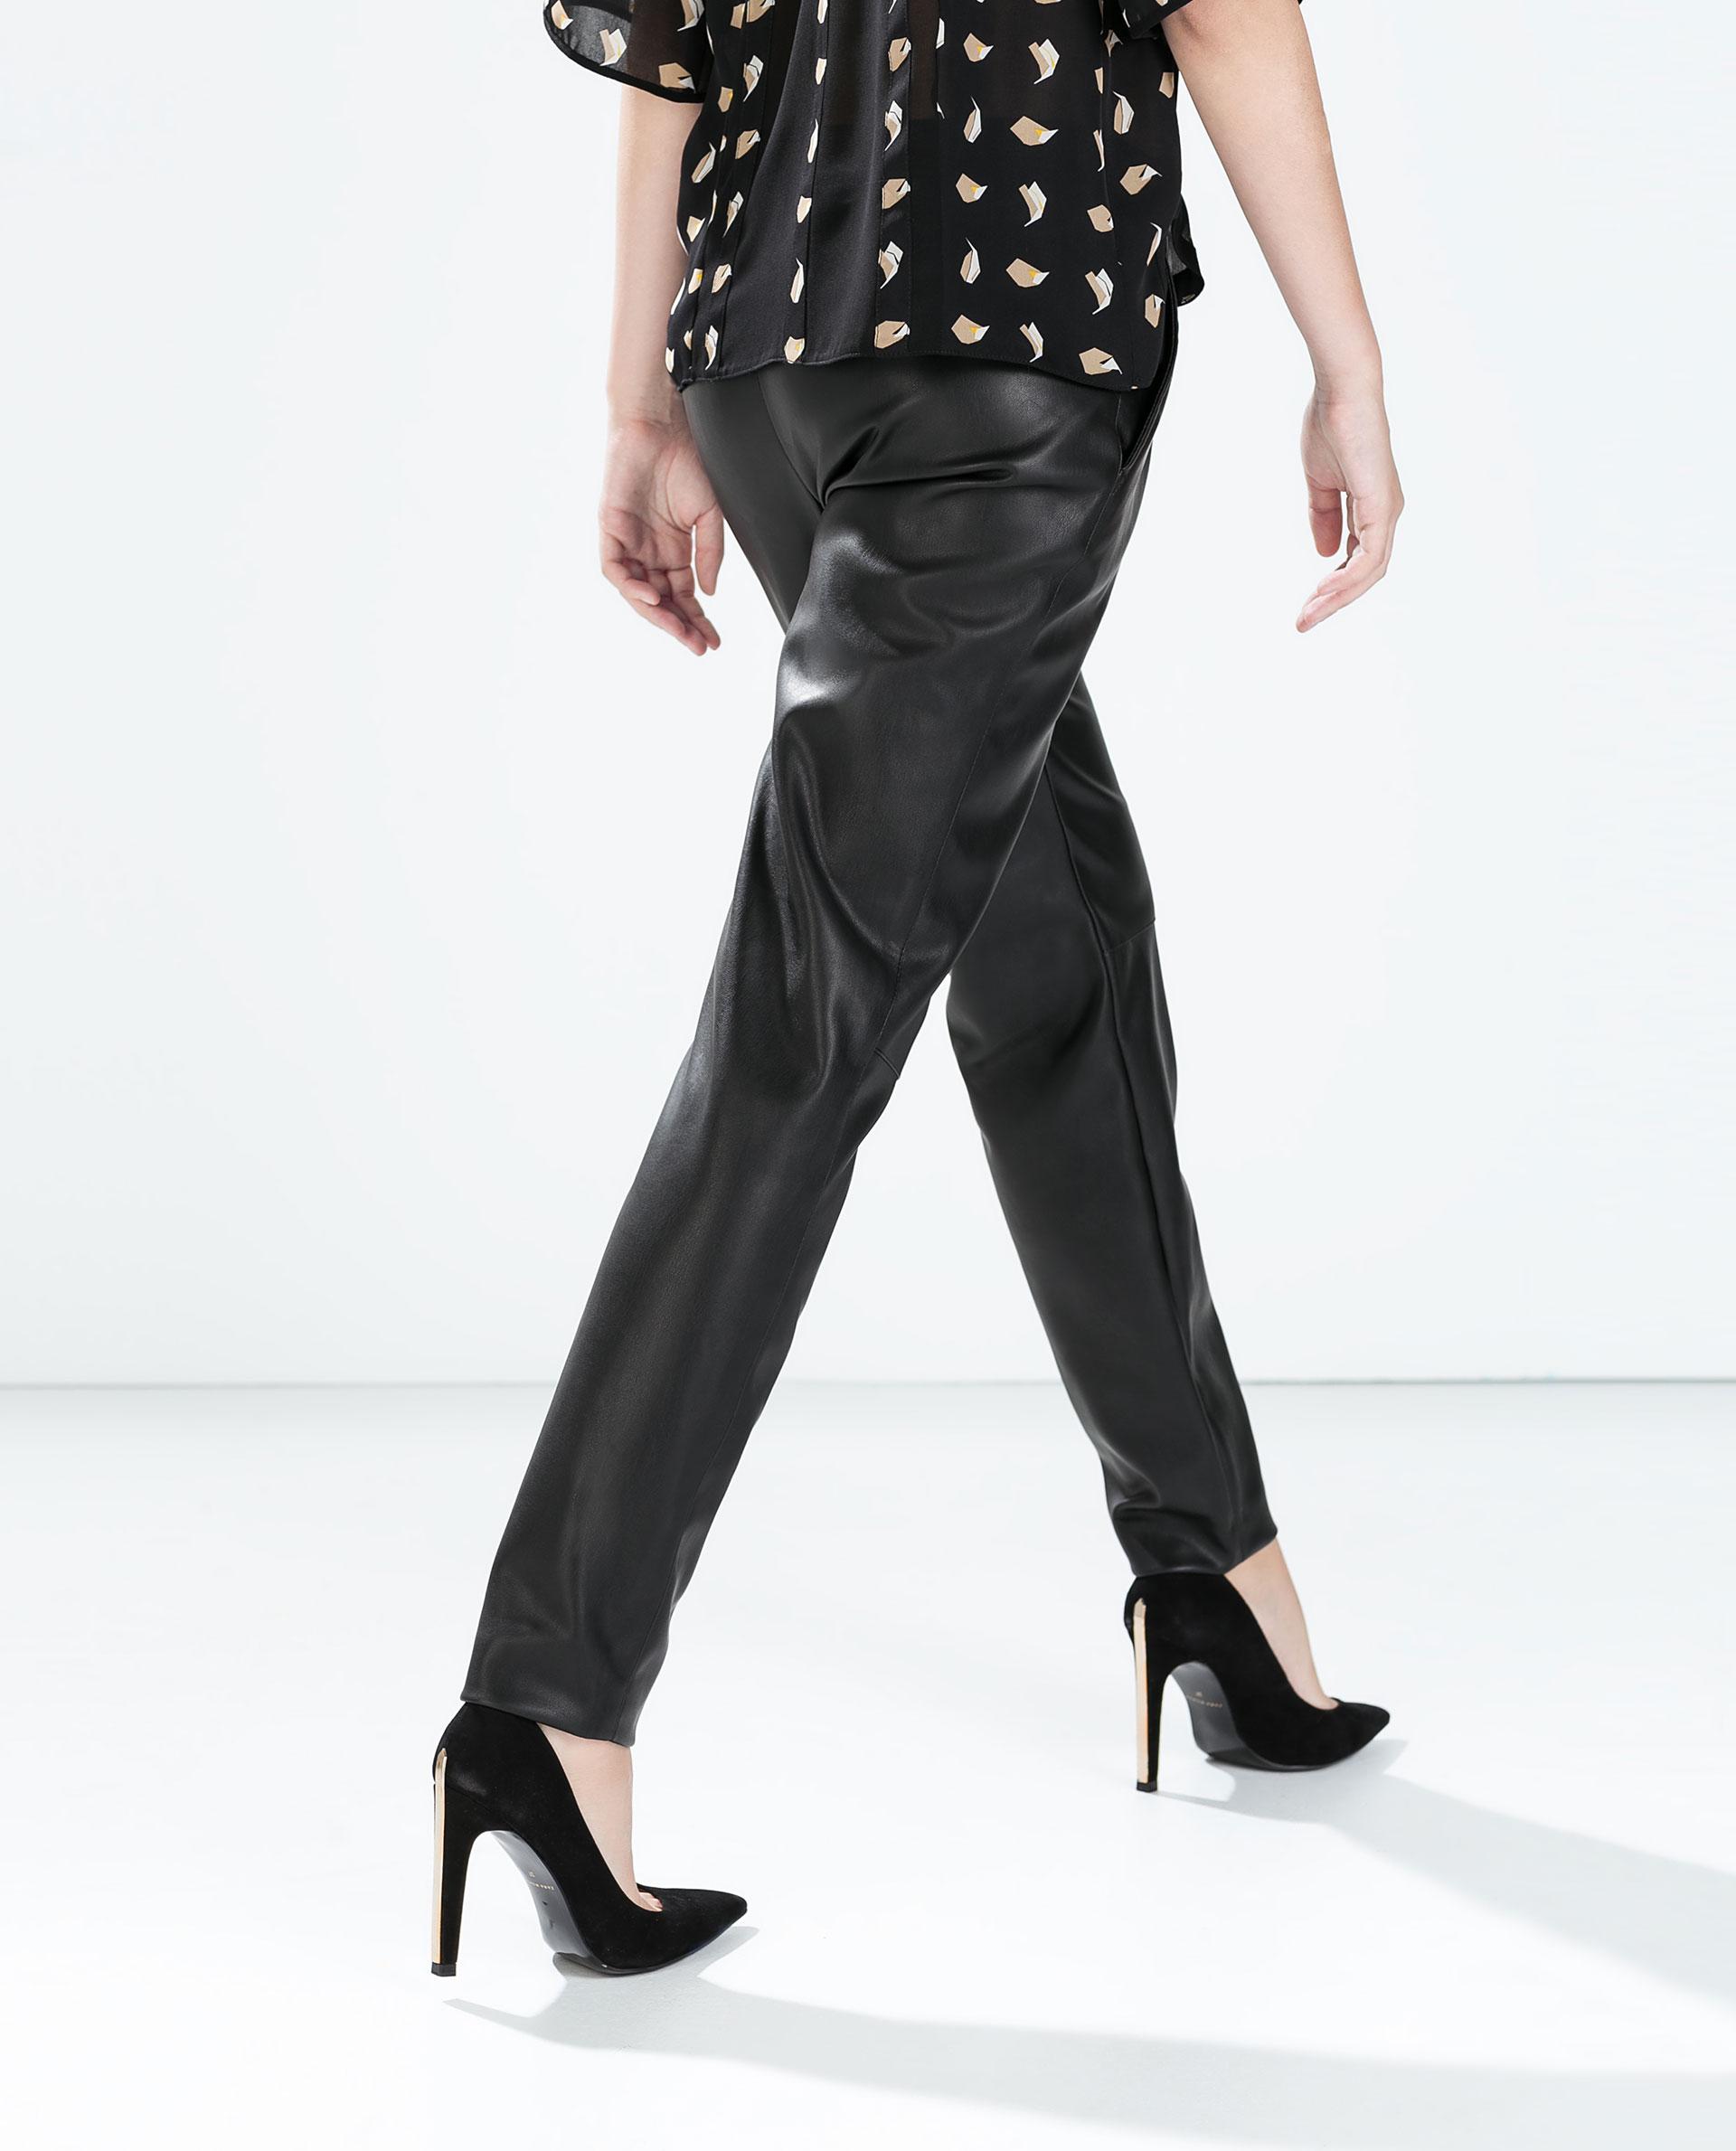 Model Women39s Black Leather Pants Women39s Faux Leather Pants